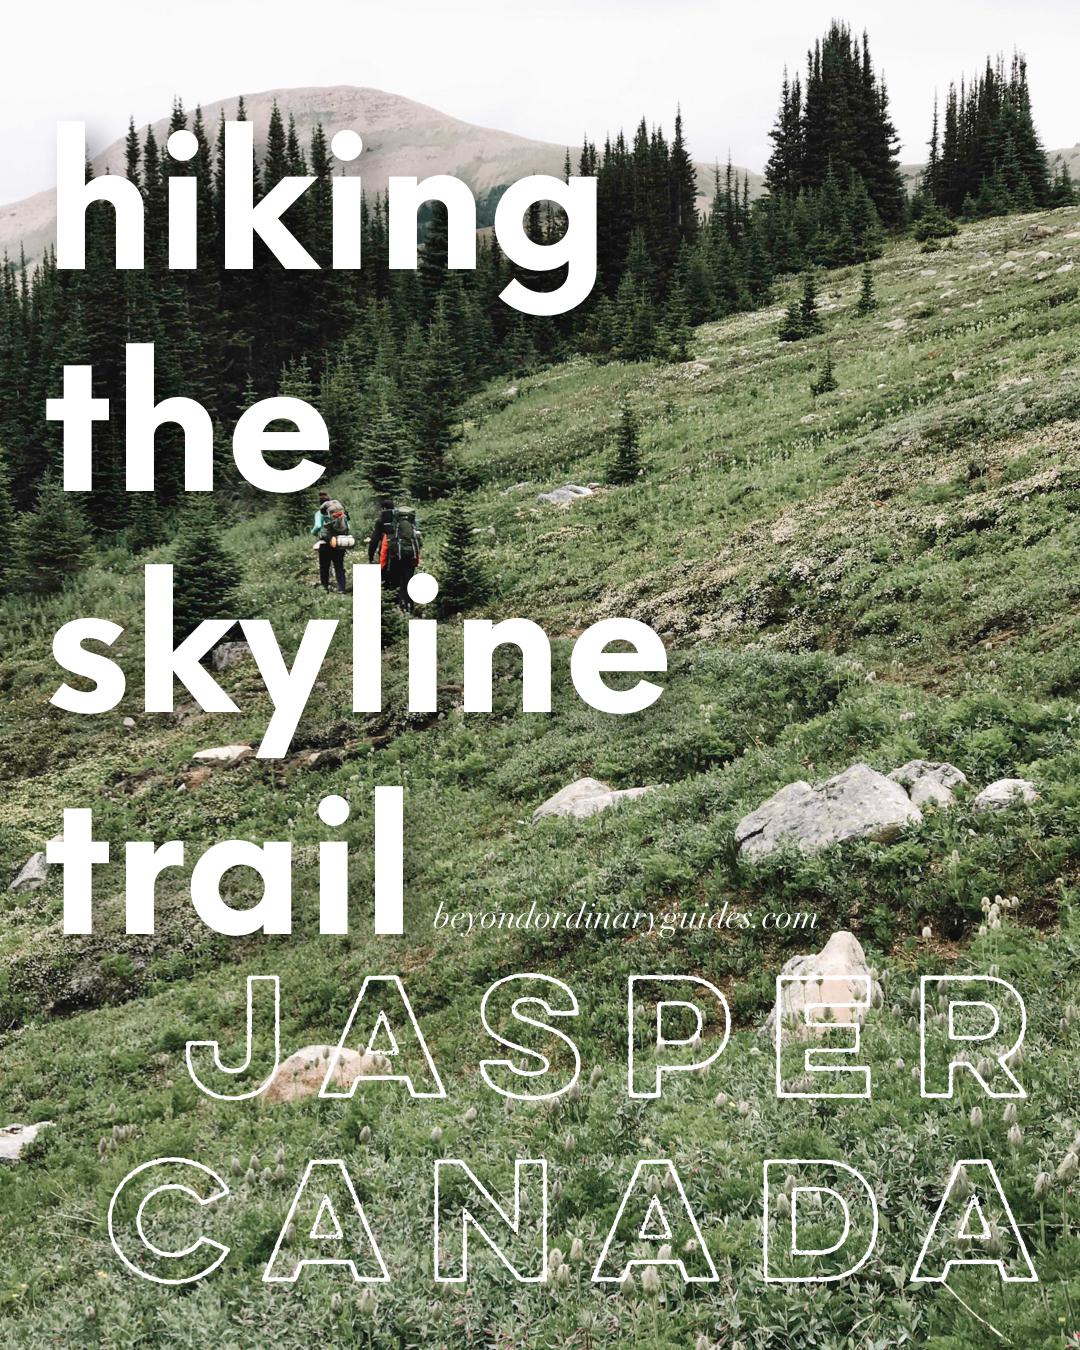 Hiking the Skyline Trail